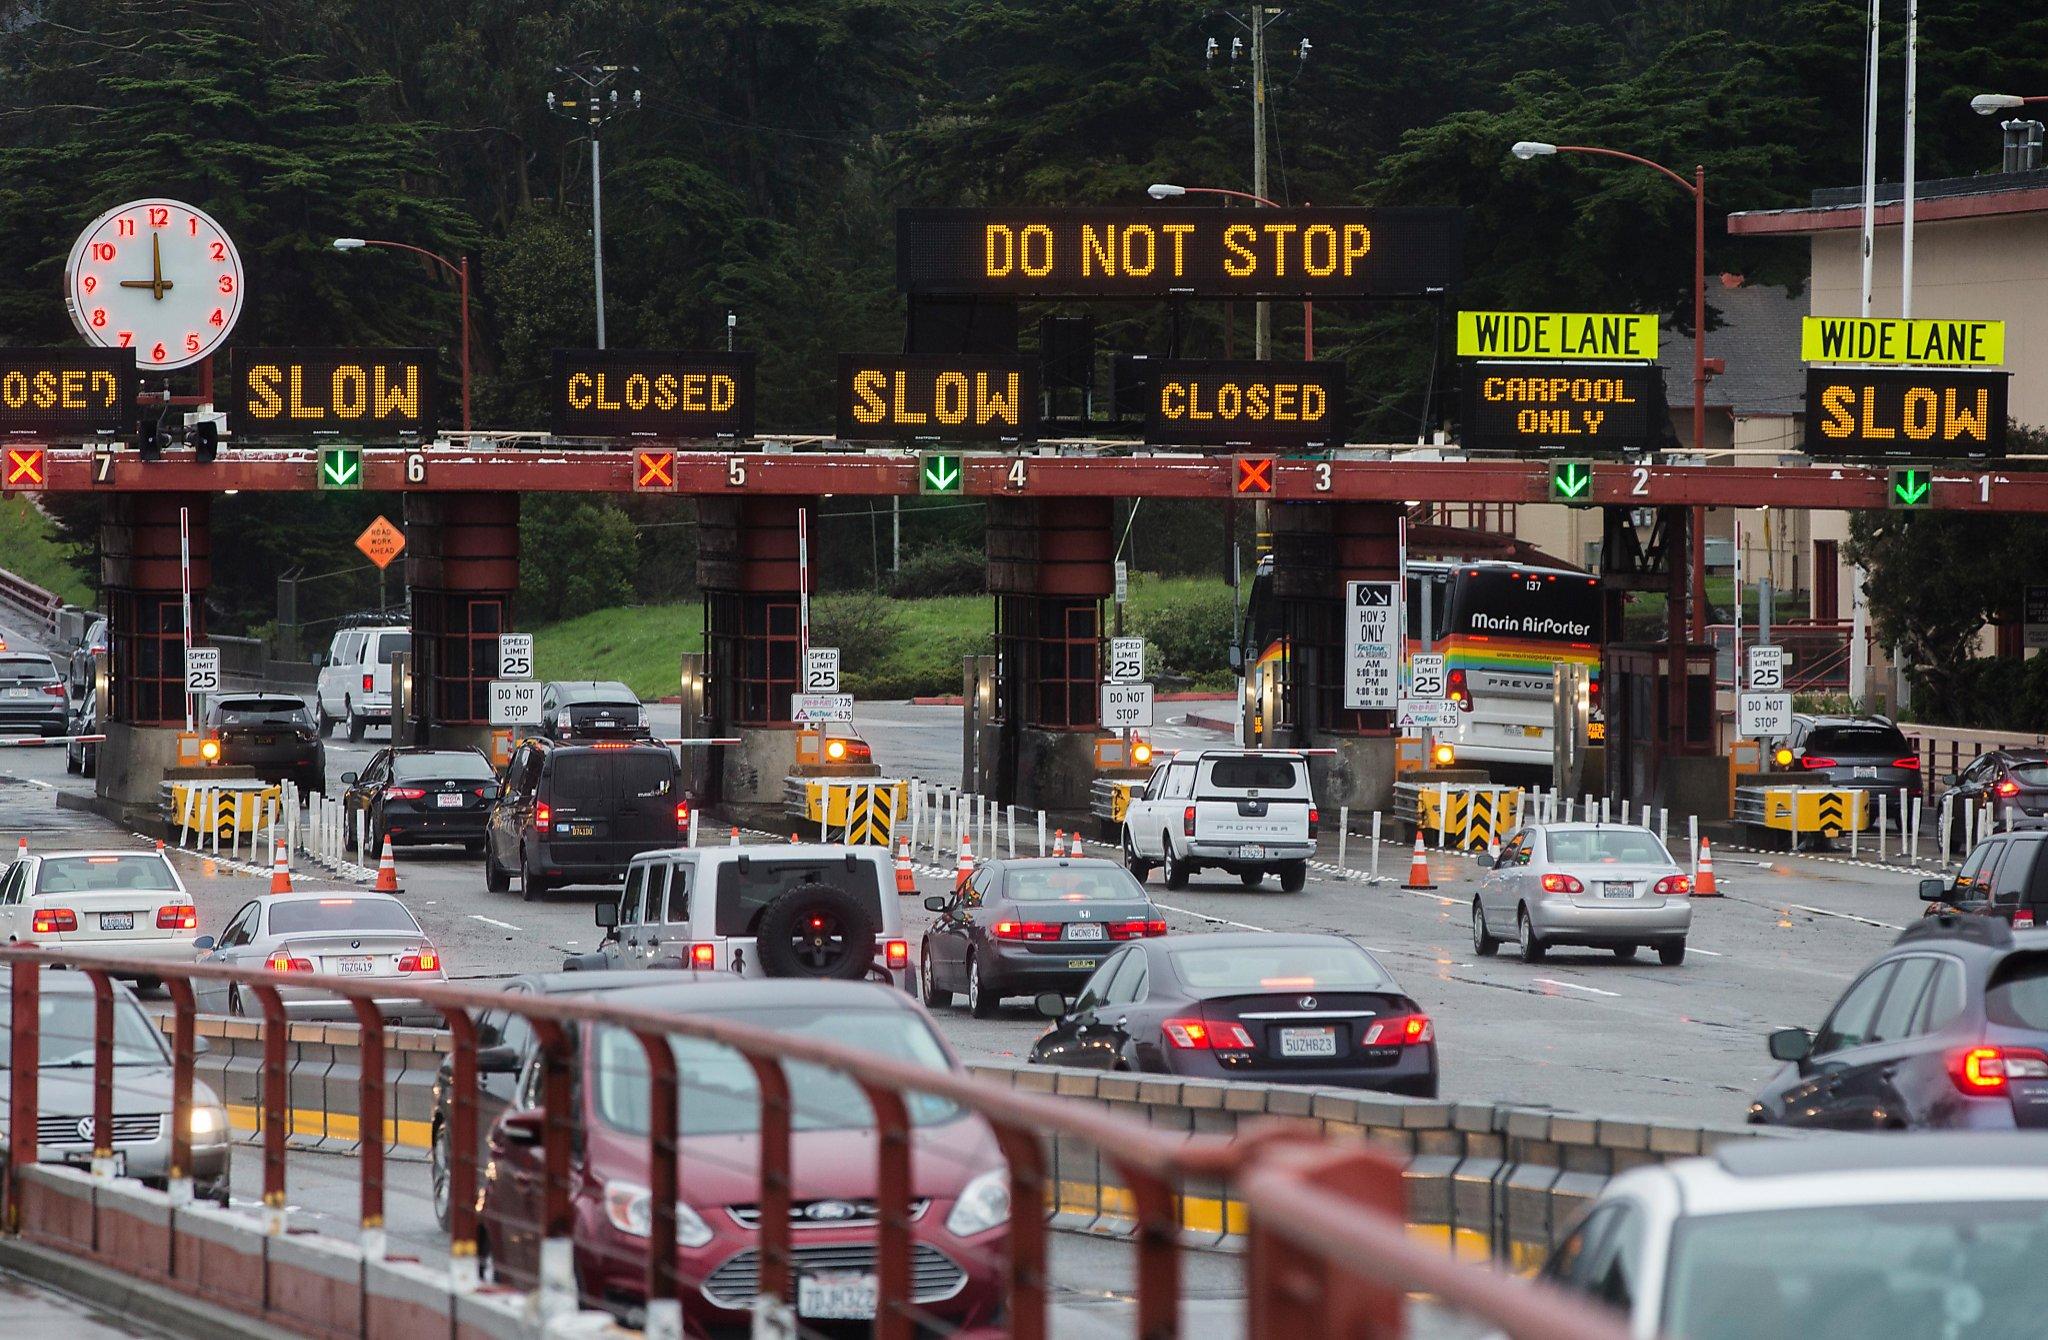 Multi-vehicle collision on northbound Golden Gate Bridge backs up